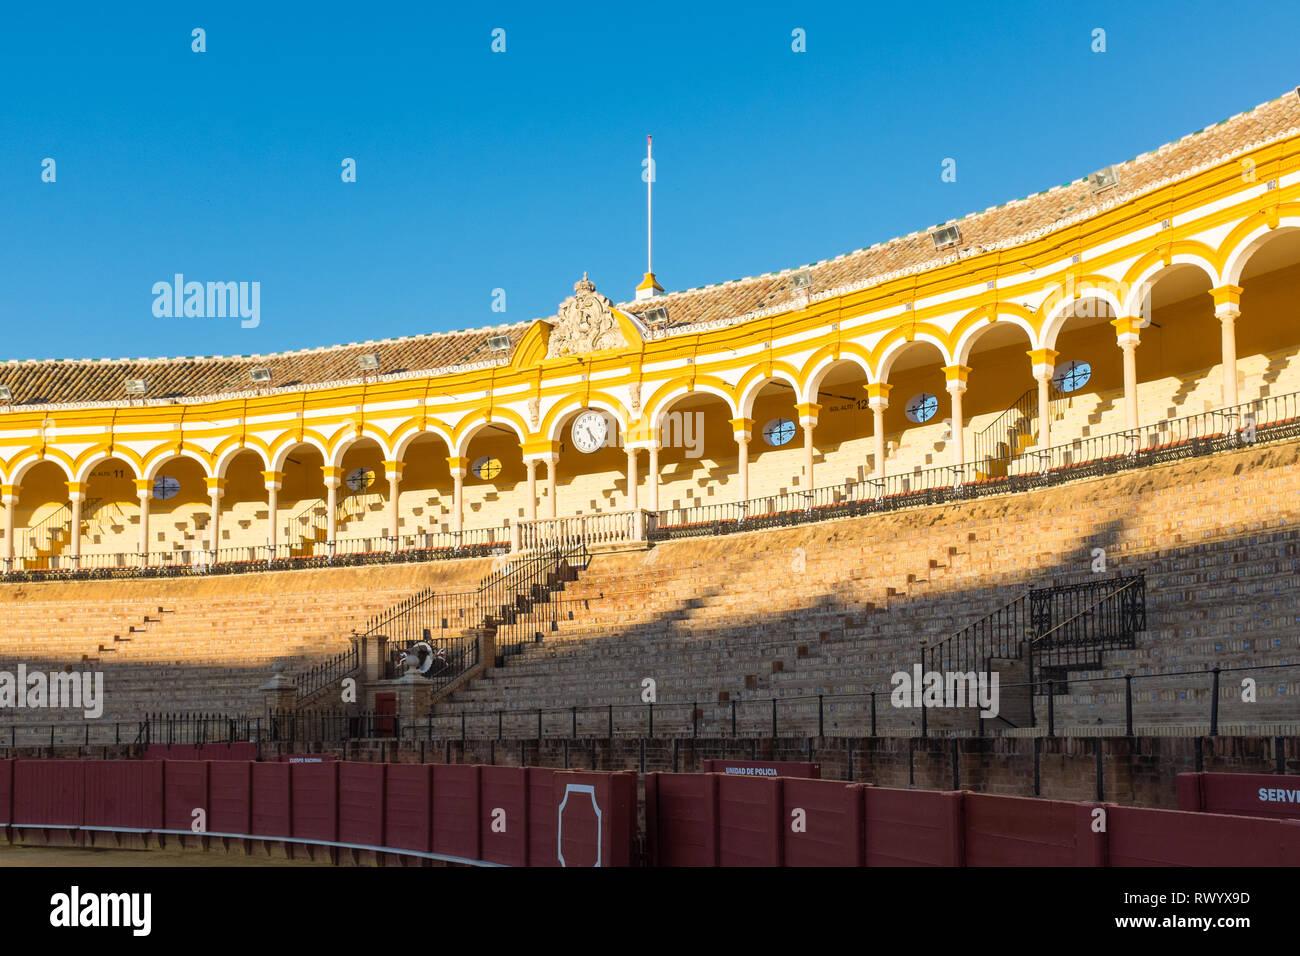 Plaza de toros de la real maestranza de caballería de Sevilla or Seville Bullring arena - Stock Image